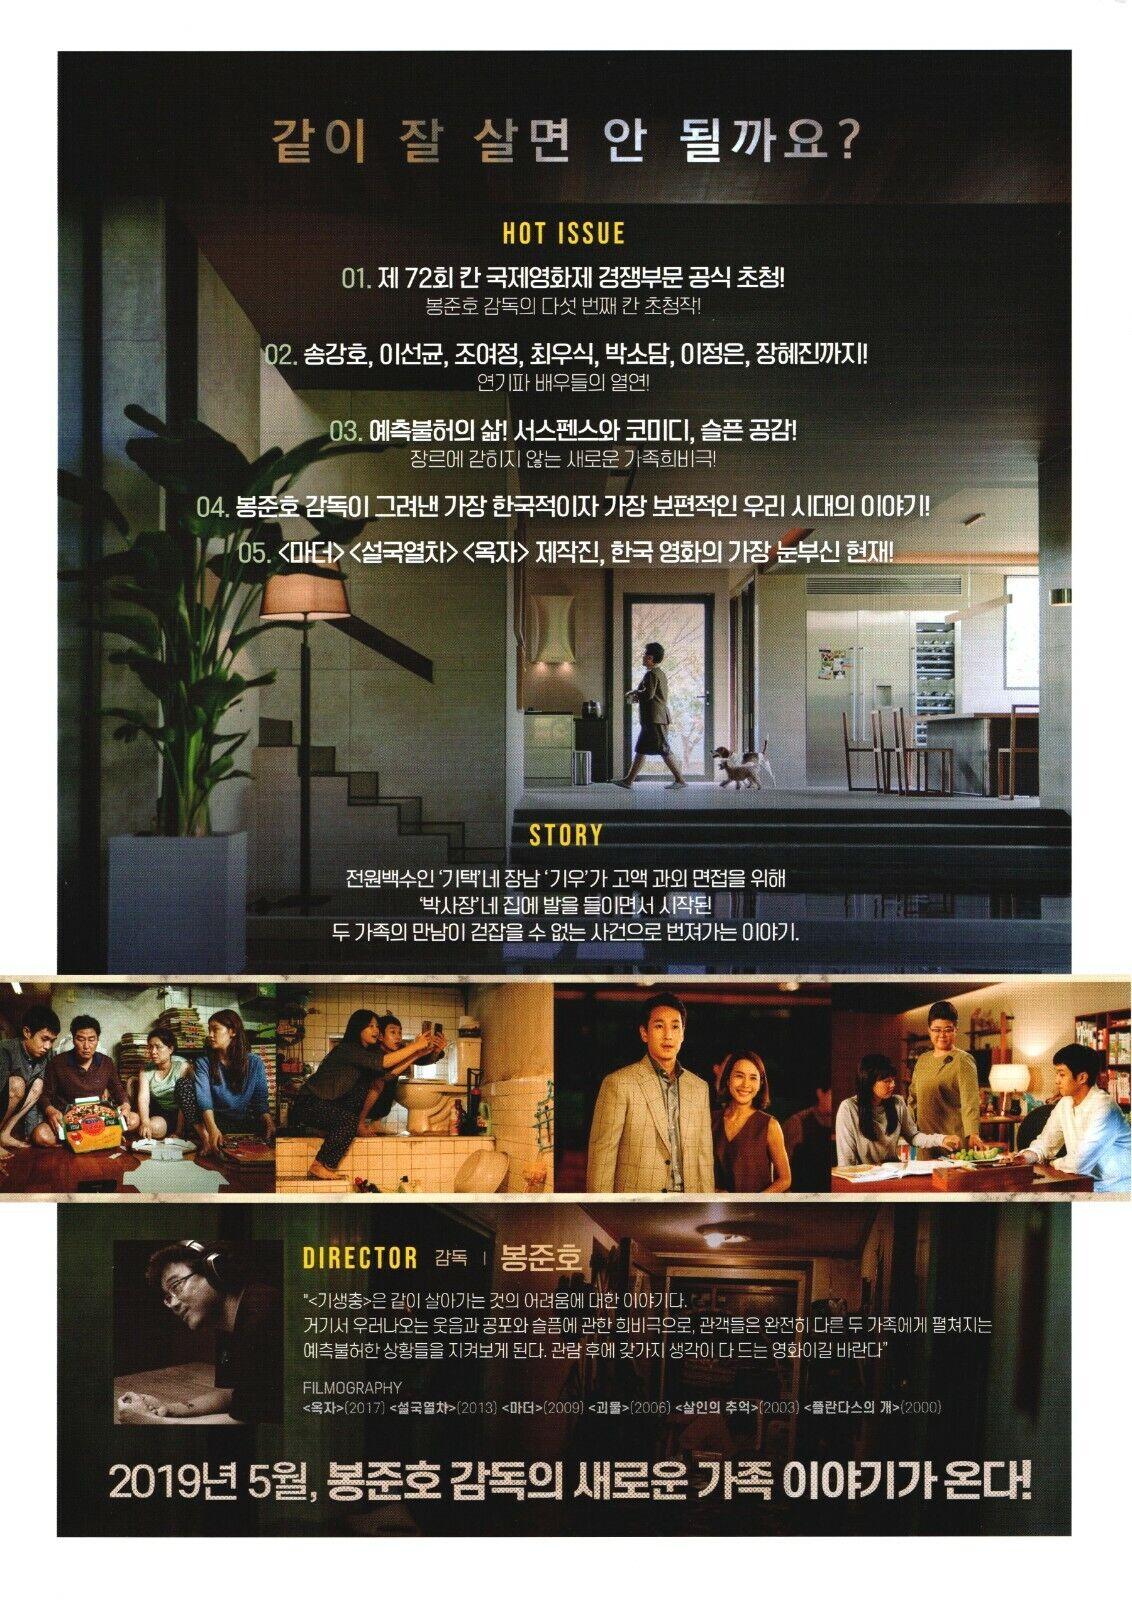 korean movie poster bong joon ho s parasite 2019 cannes golden palm a4 size